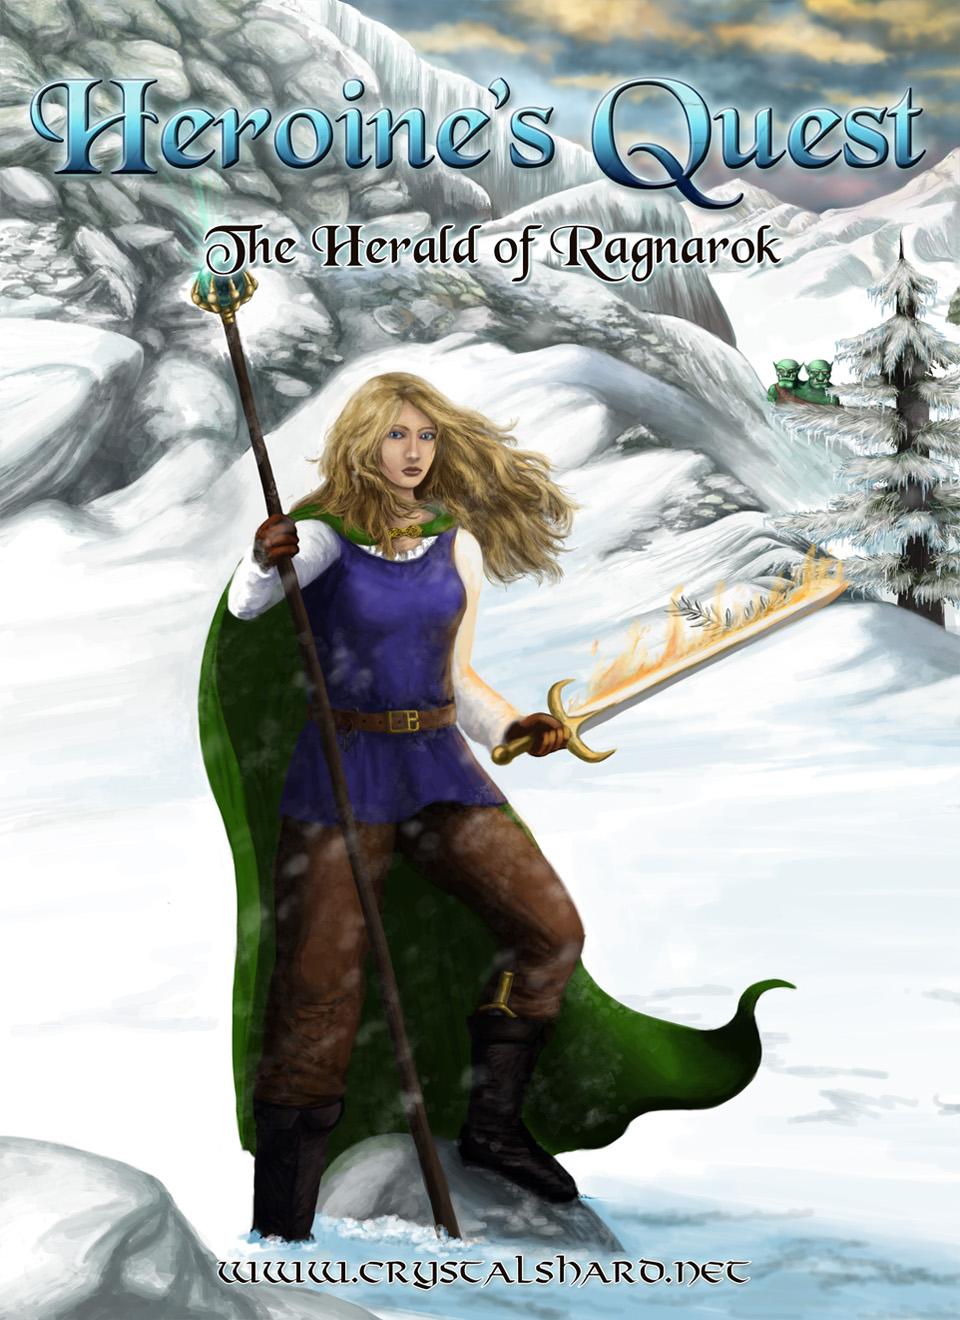 High Resolution Wallpaper | Heroine's Quest: The Herald Of Ragnarok 960x1320 px